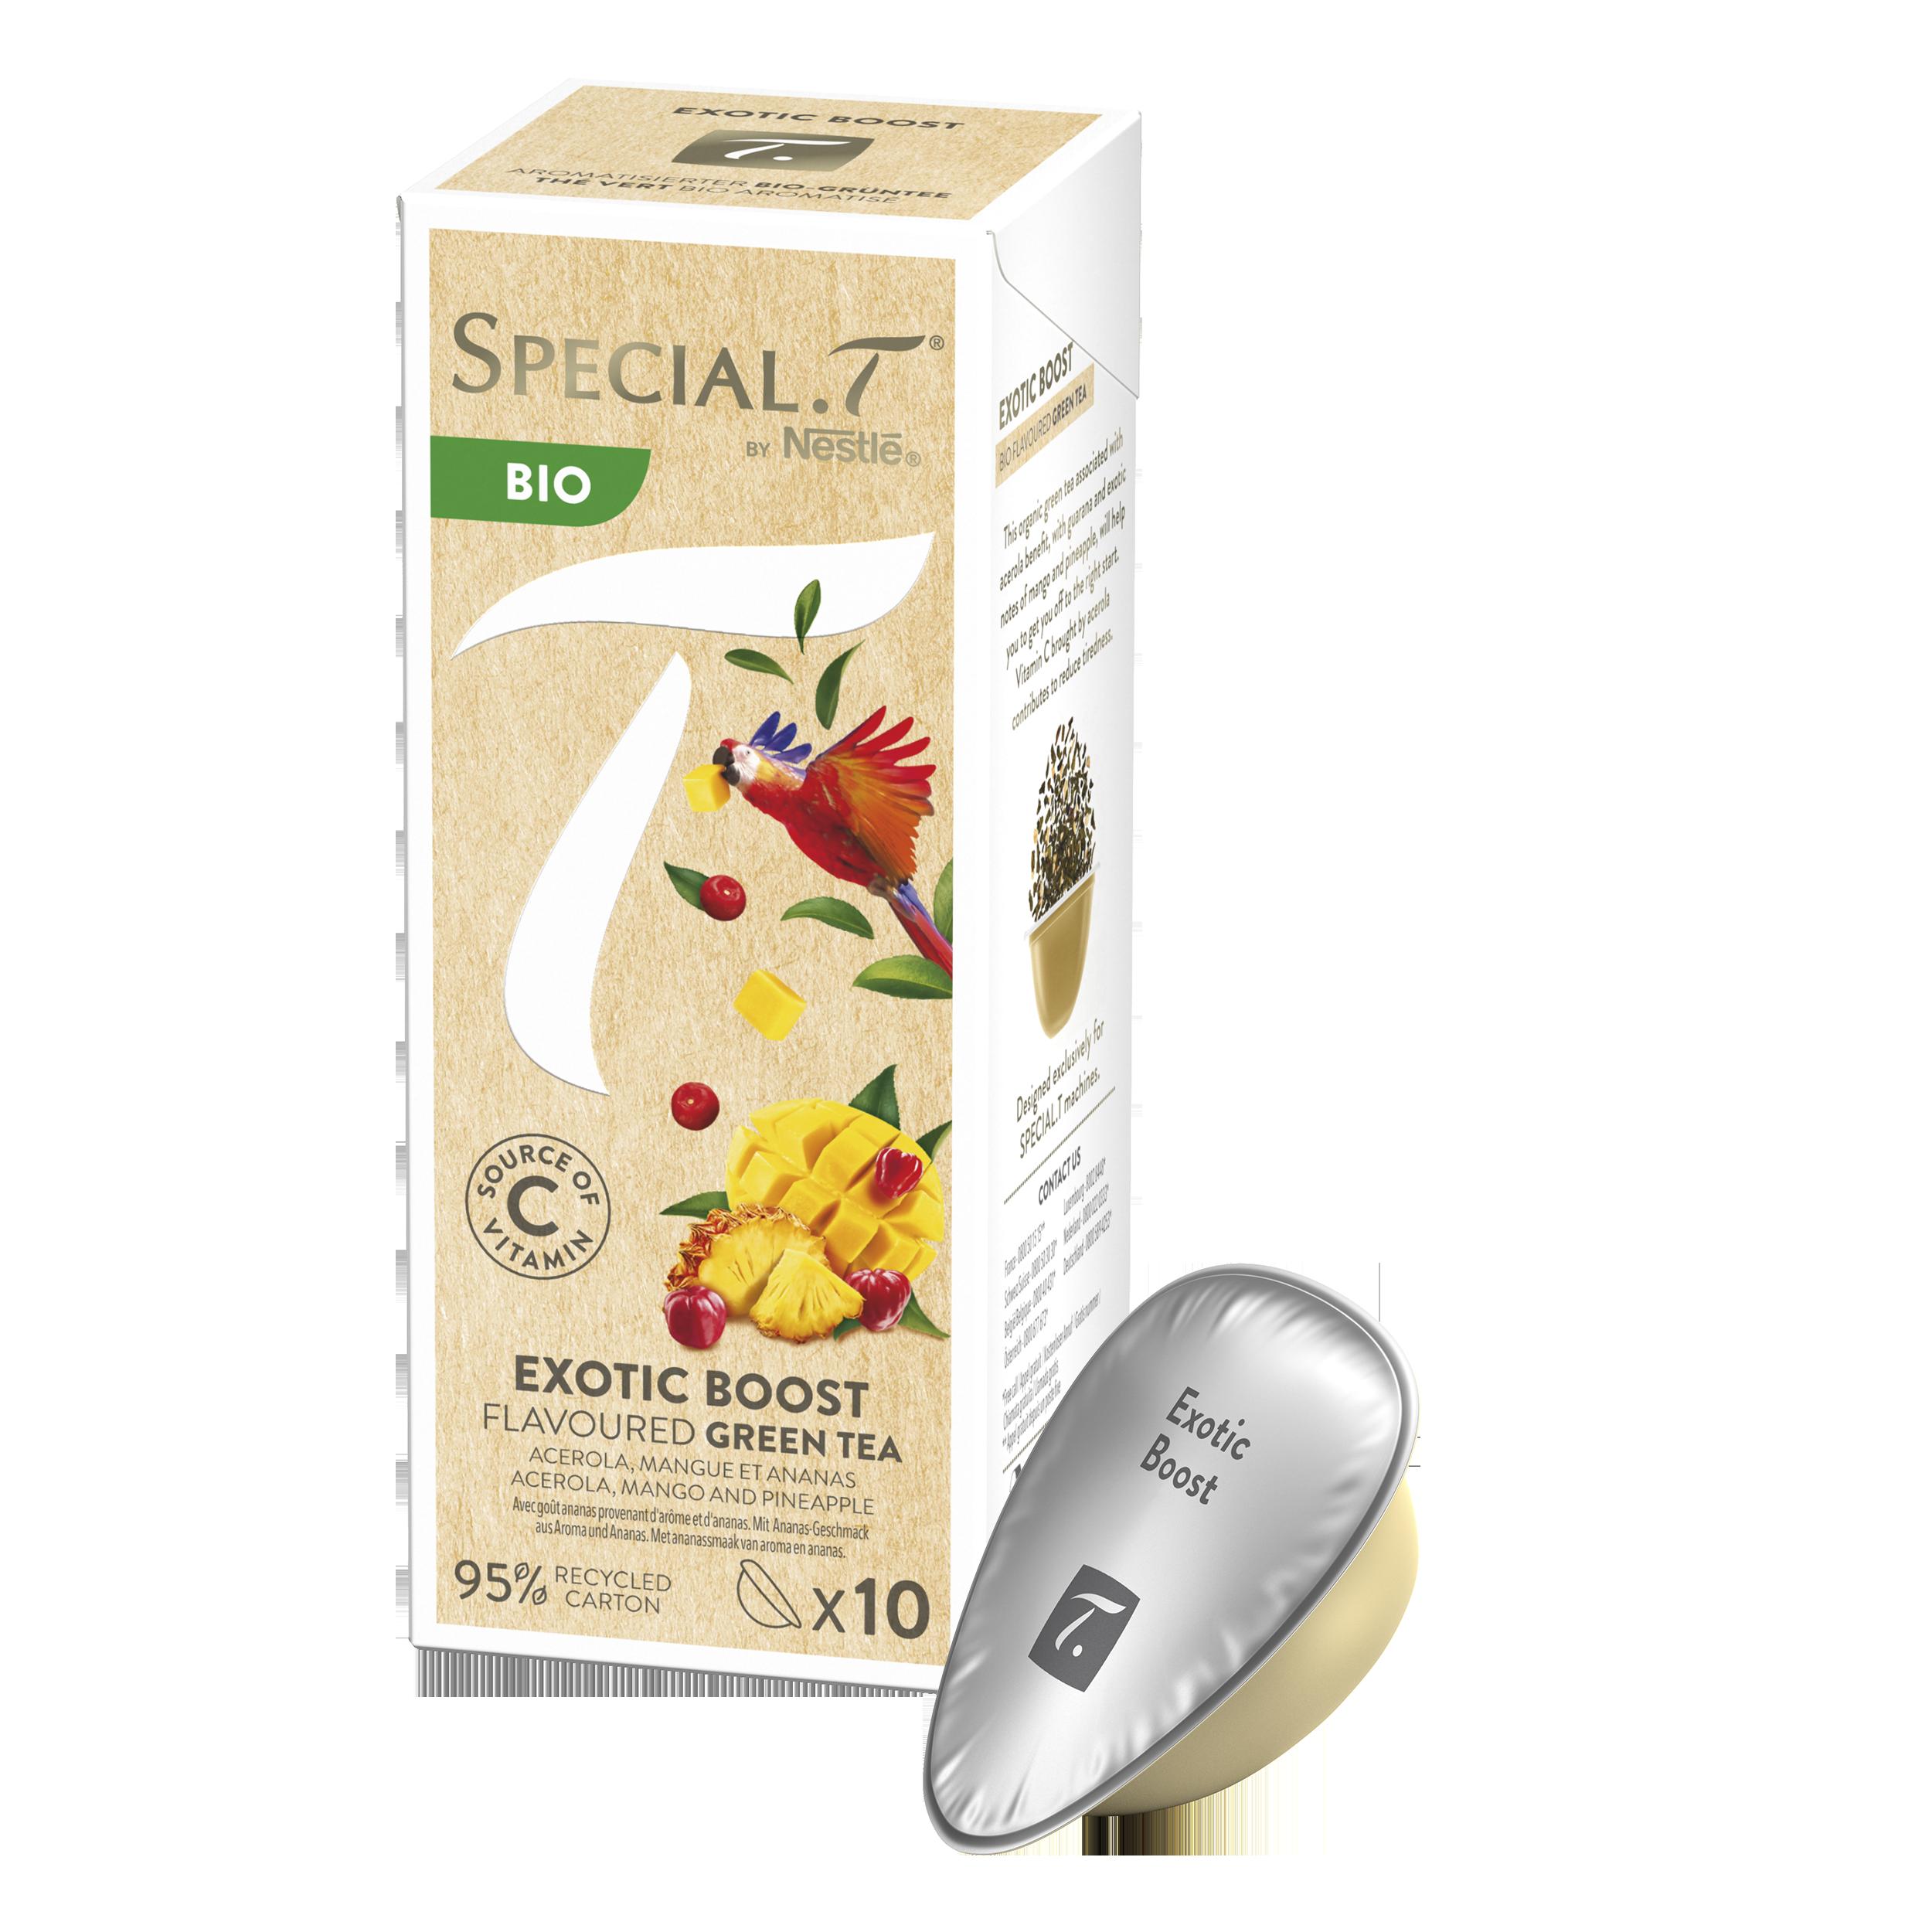 Thé vert - Capsule Exotic Boost bio - Special.T - Vrac - Kusmi Tea